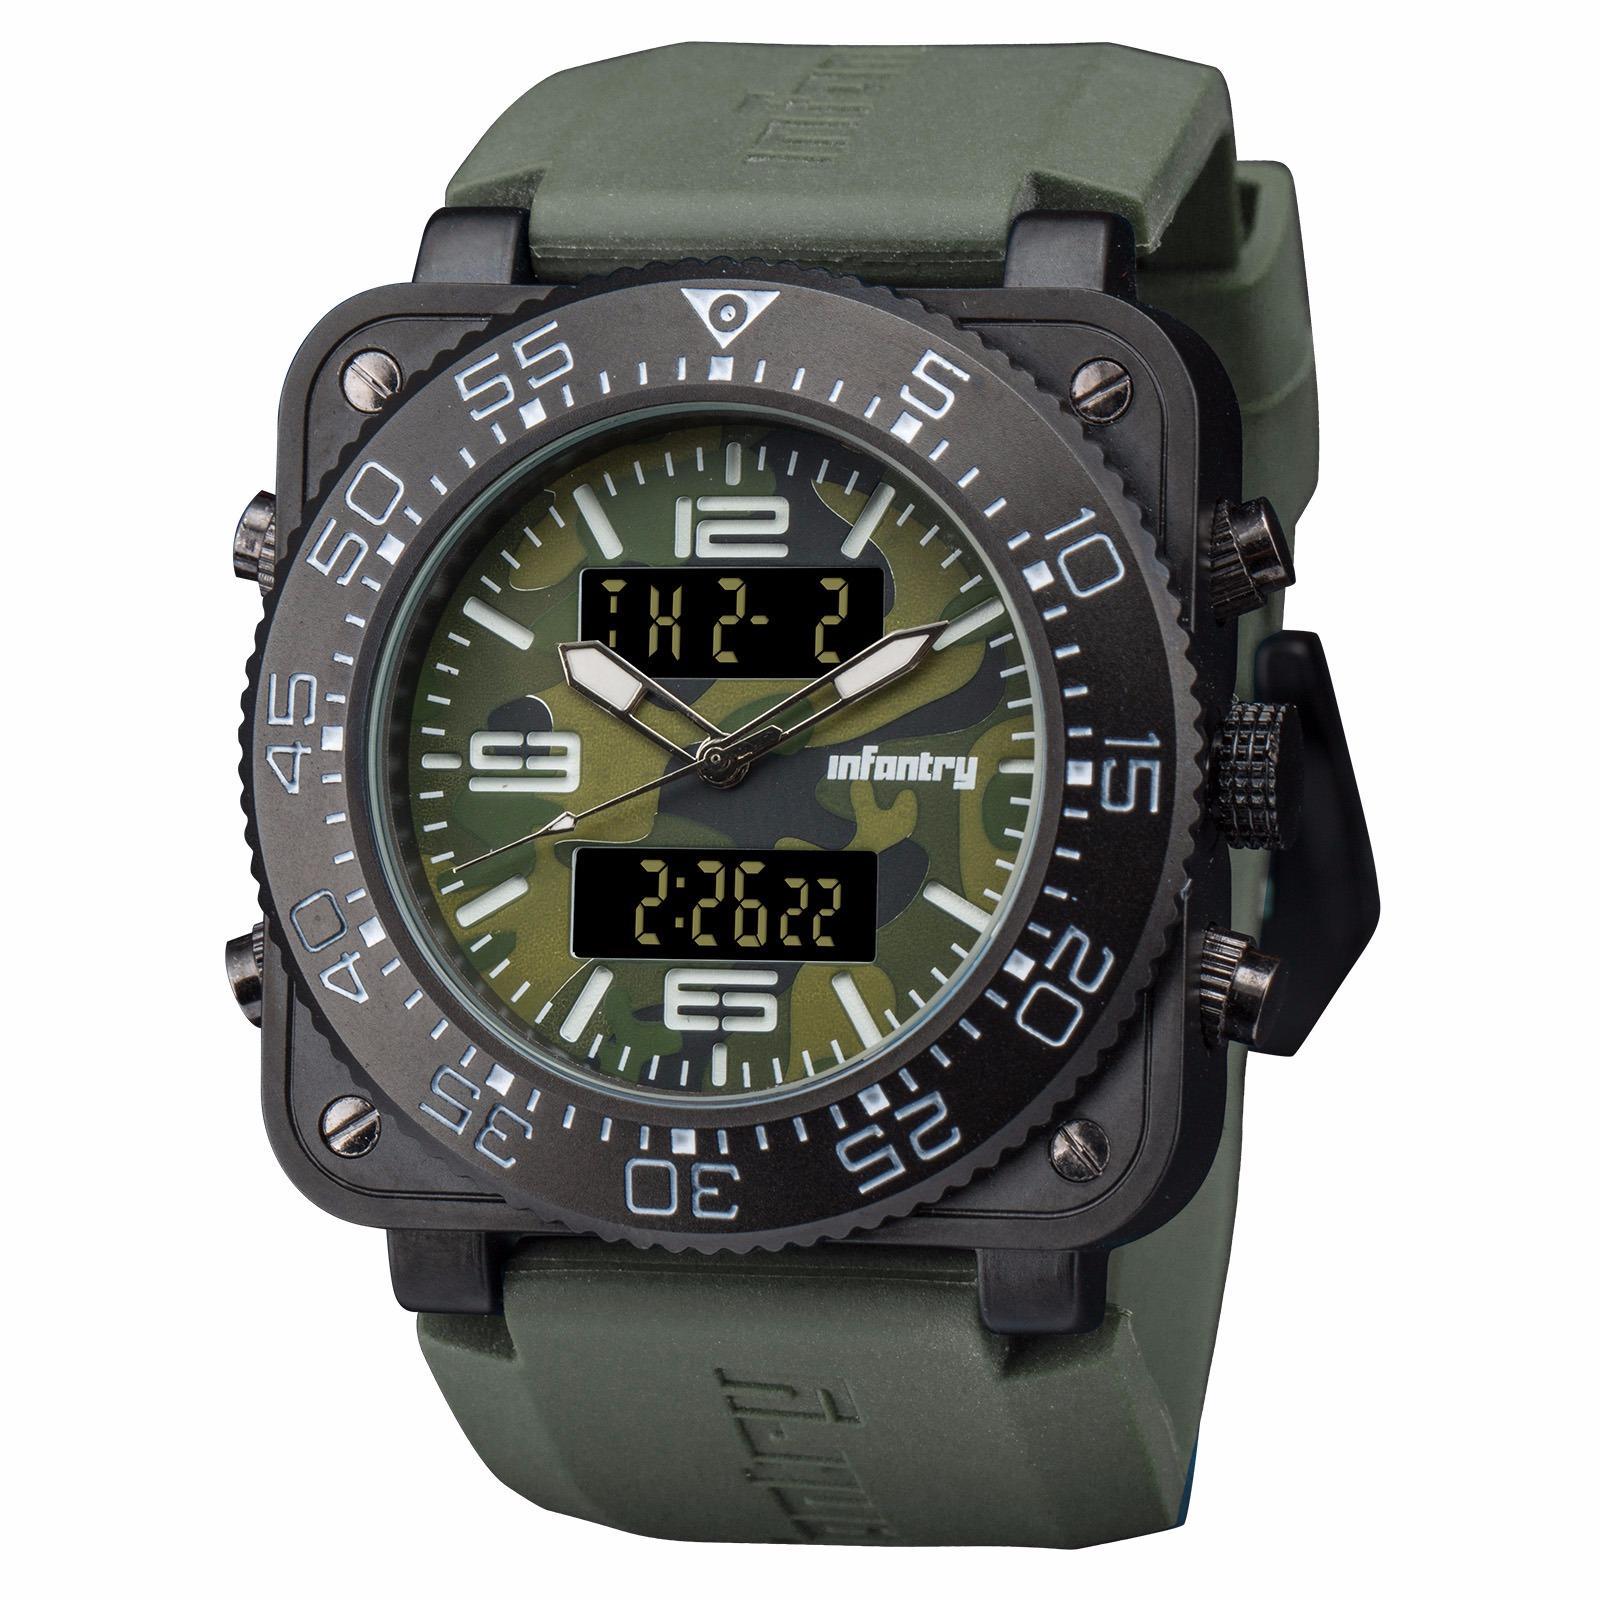 d333fd23f558 INFANTRY Mens Digital Quartz Wrist Watch Stopwatch Alarm Sport LCD  Chronograph